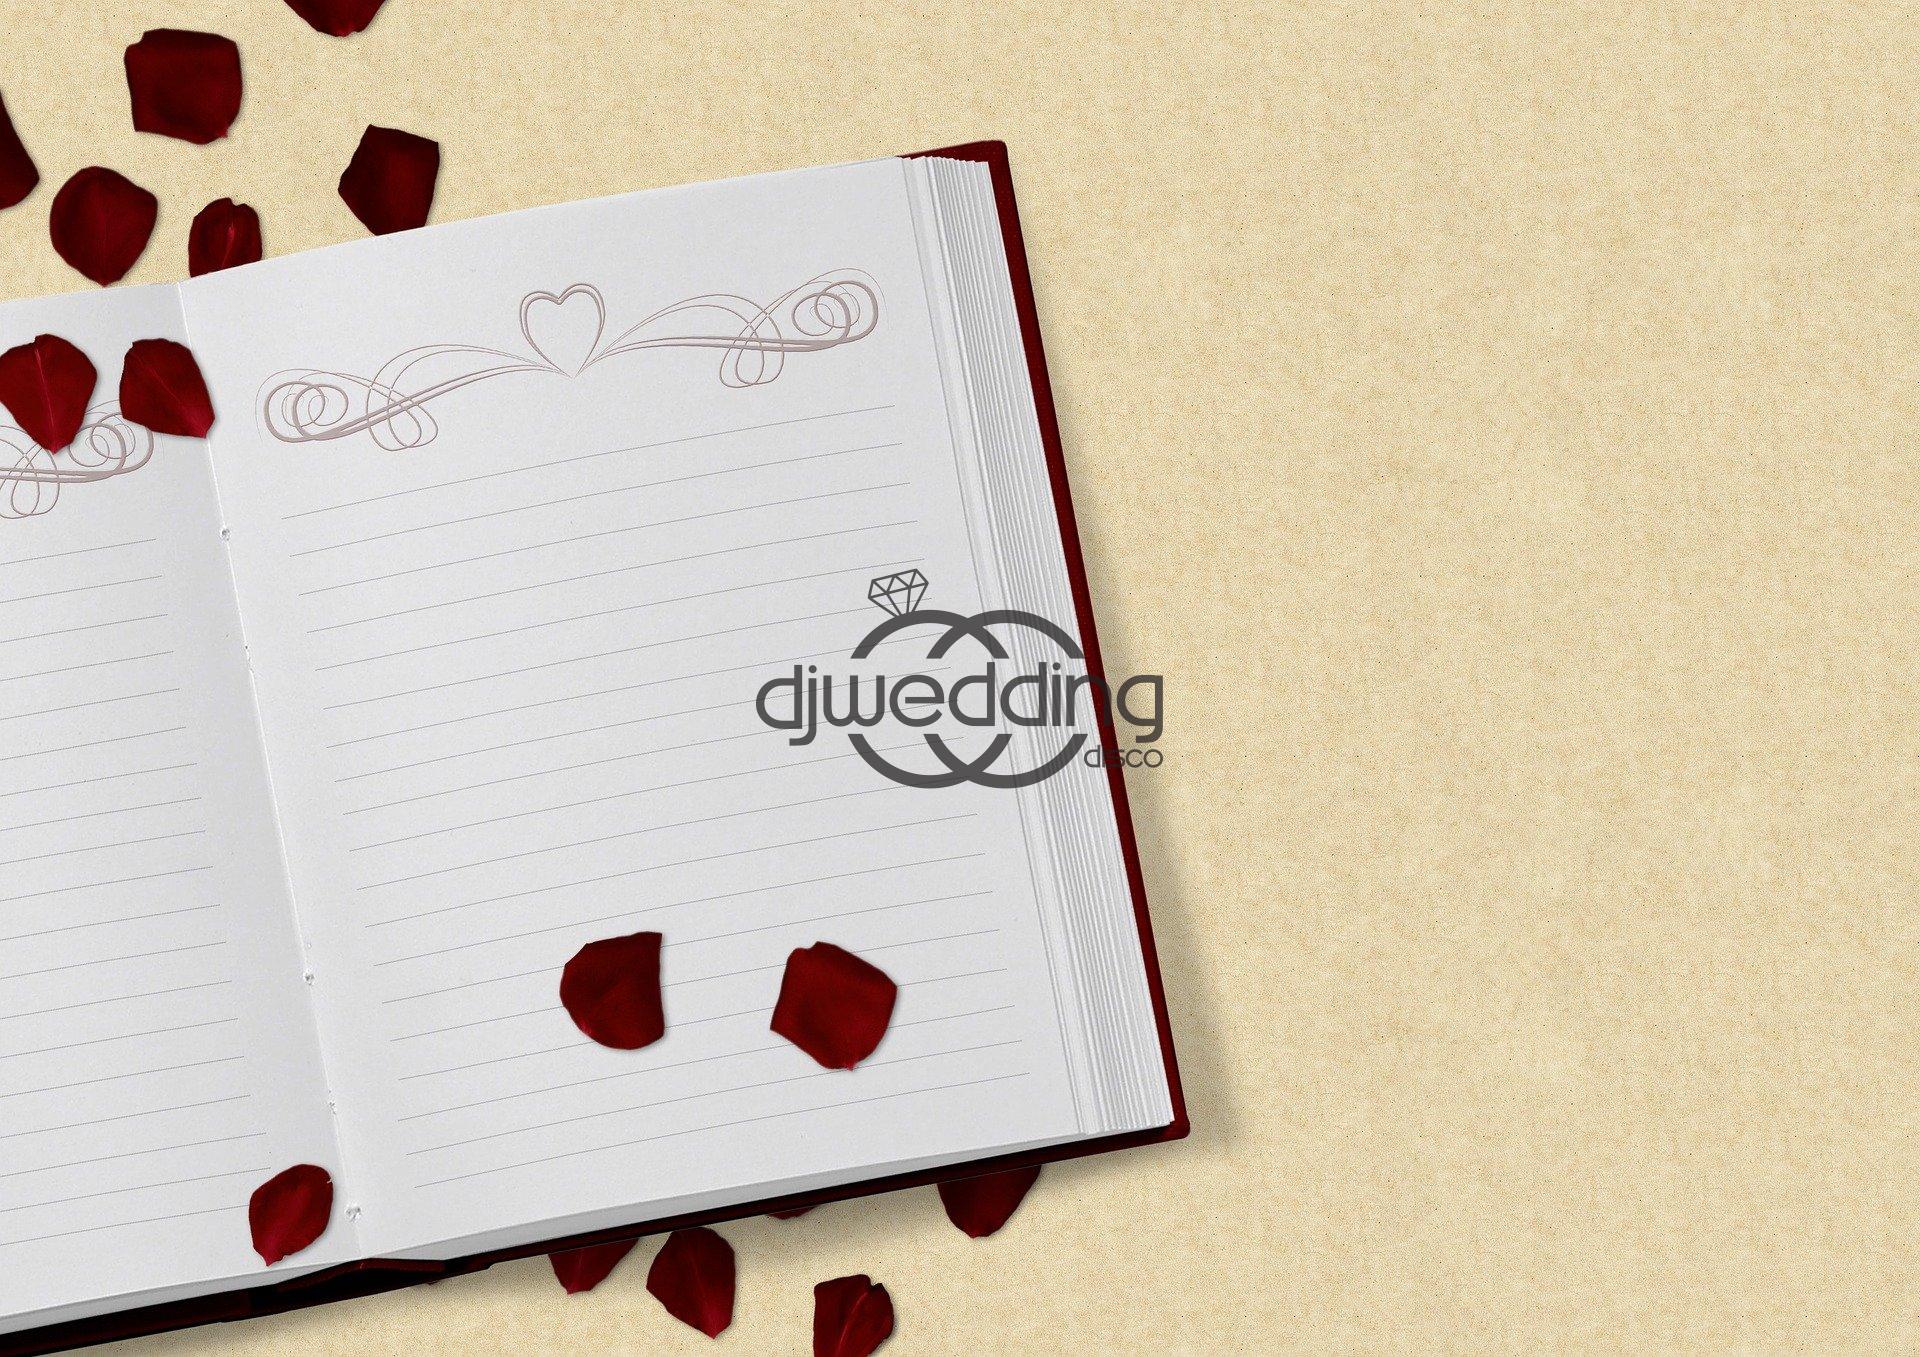 wedding-dj-mobile-disco-gaw-DJ-Wedding-Disco-Photo-booth-dance-floor-sparks-dry-ice-confetti-love-letter-hire